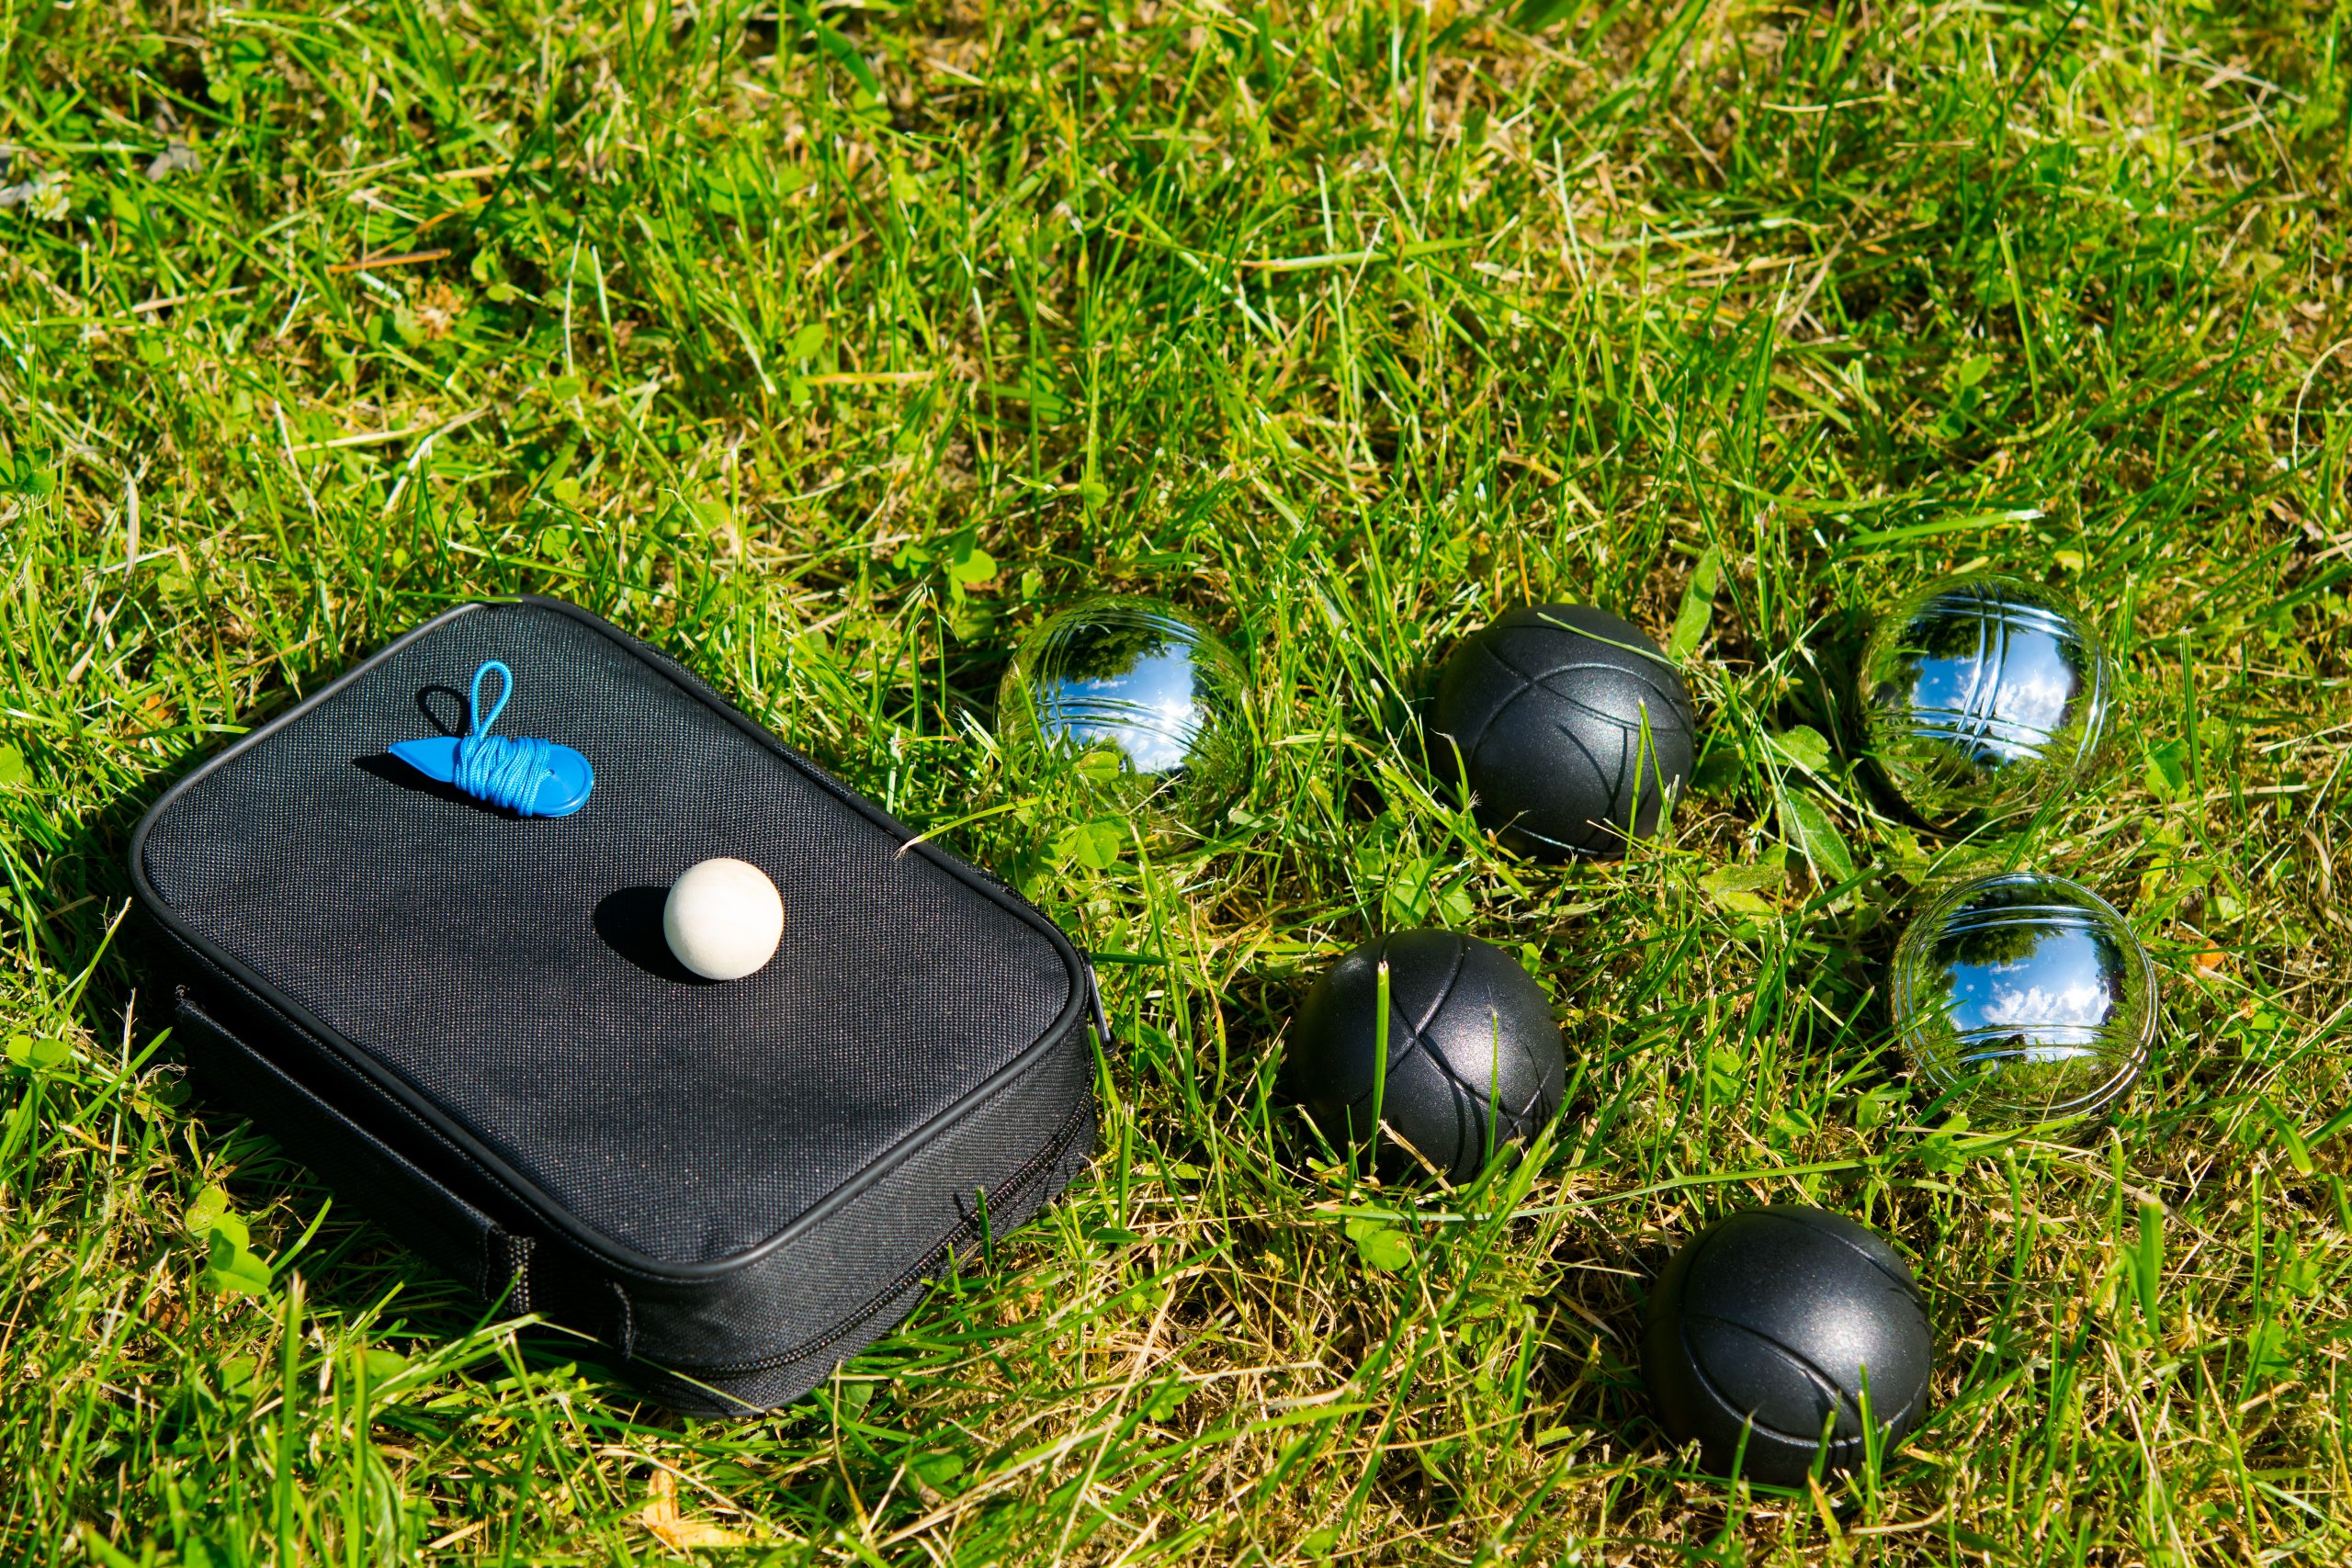 Boule Kugeln: Test & Empfehlungen (04/21)